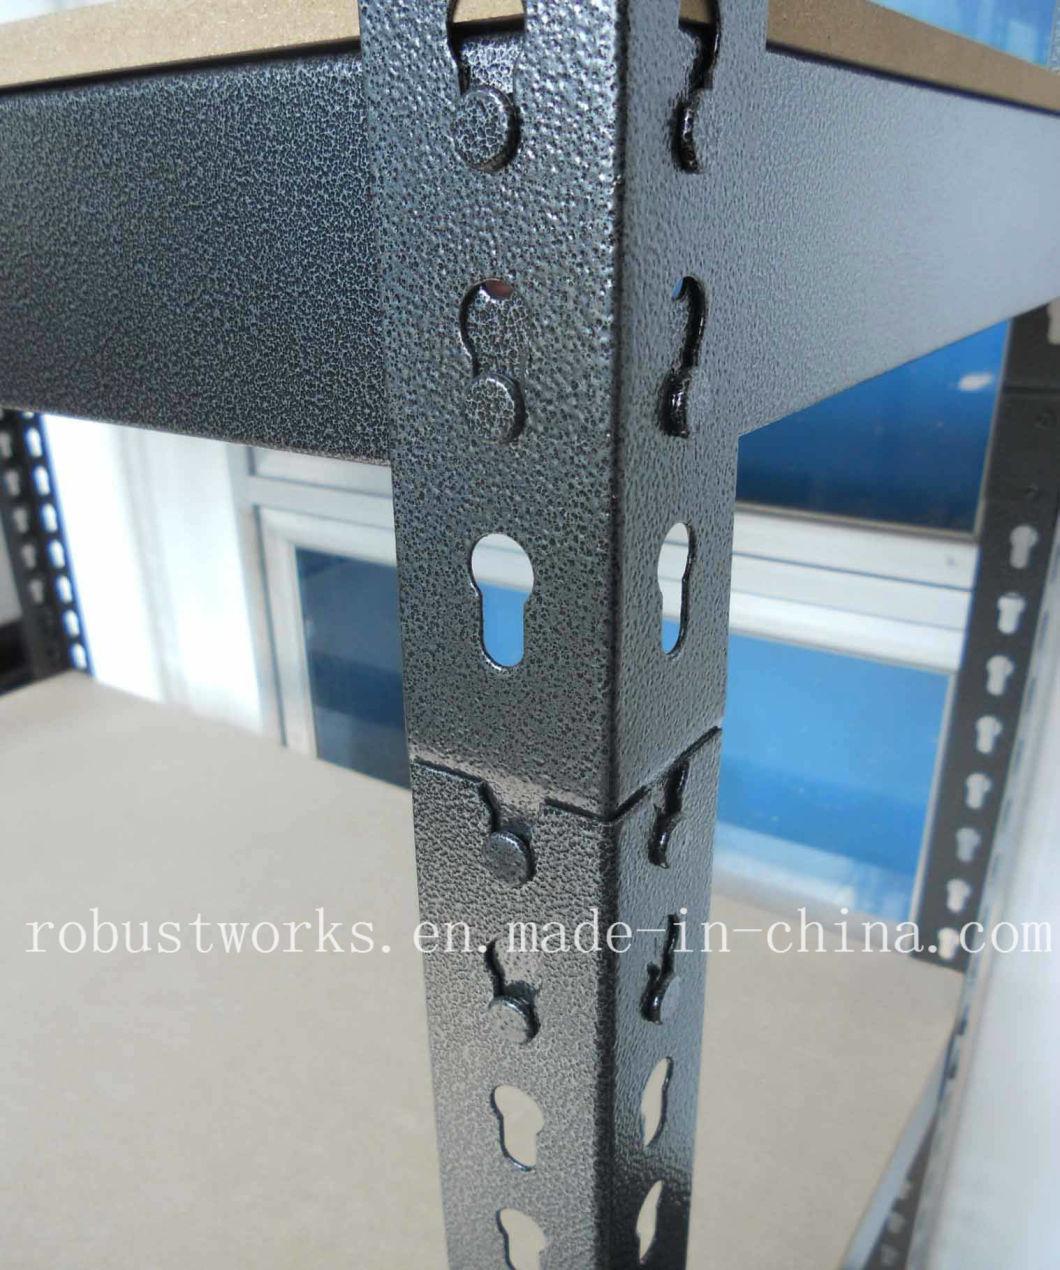 5 Tiers Storage Shelf Steel Rack (8040-100)